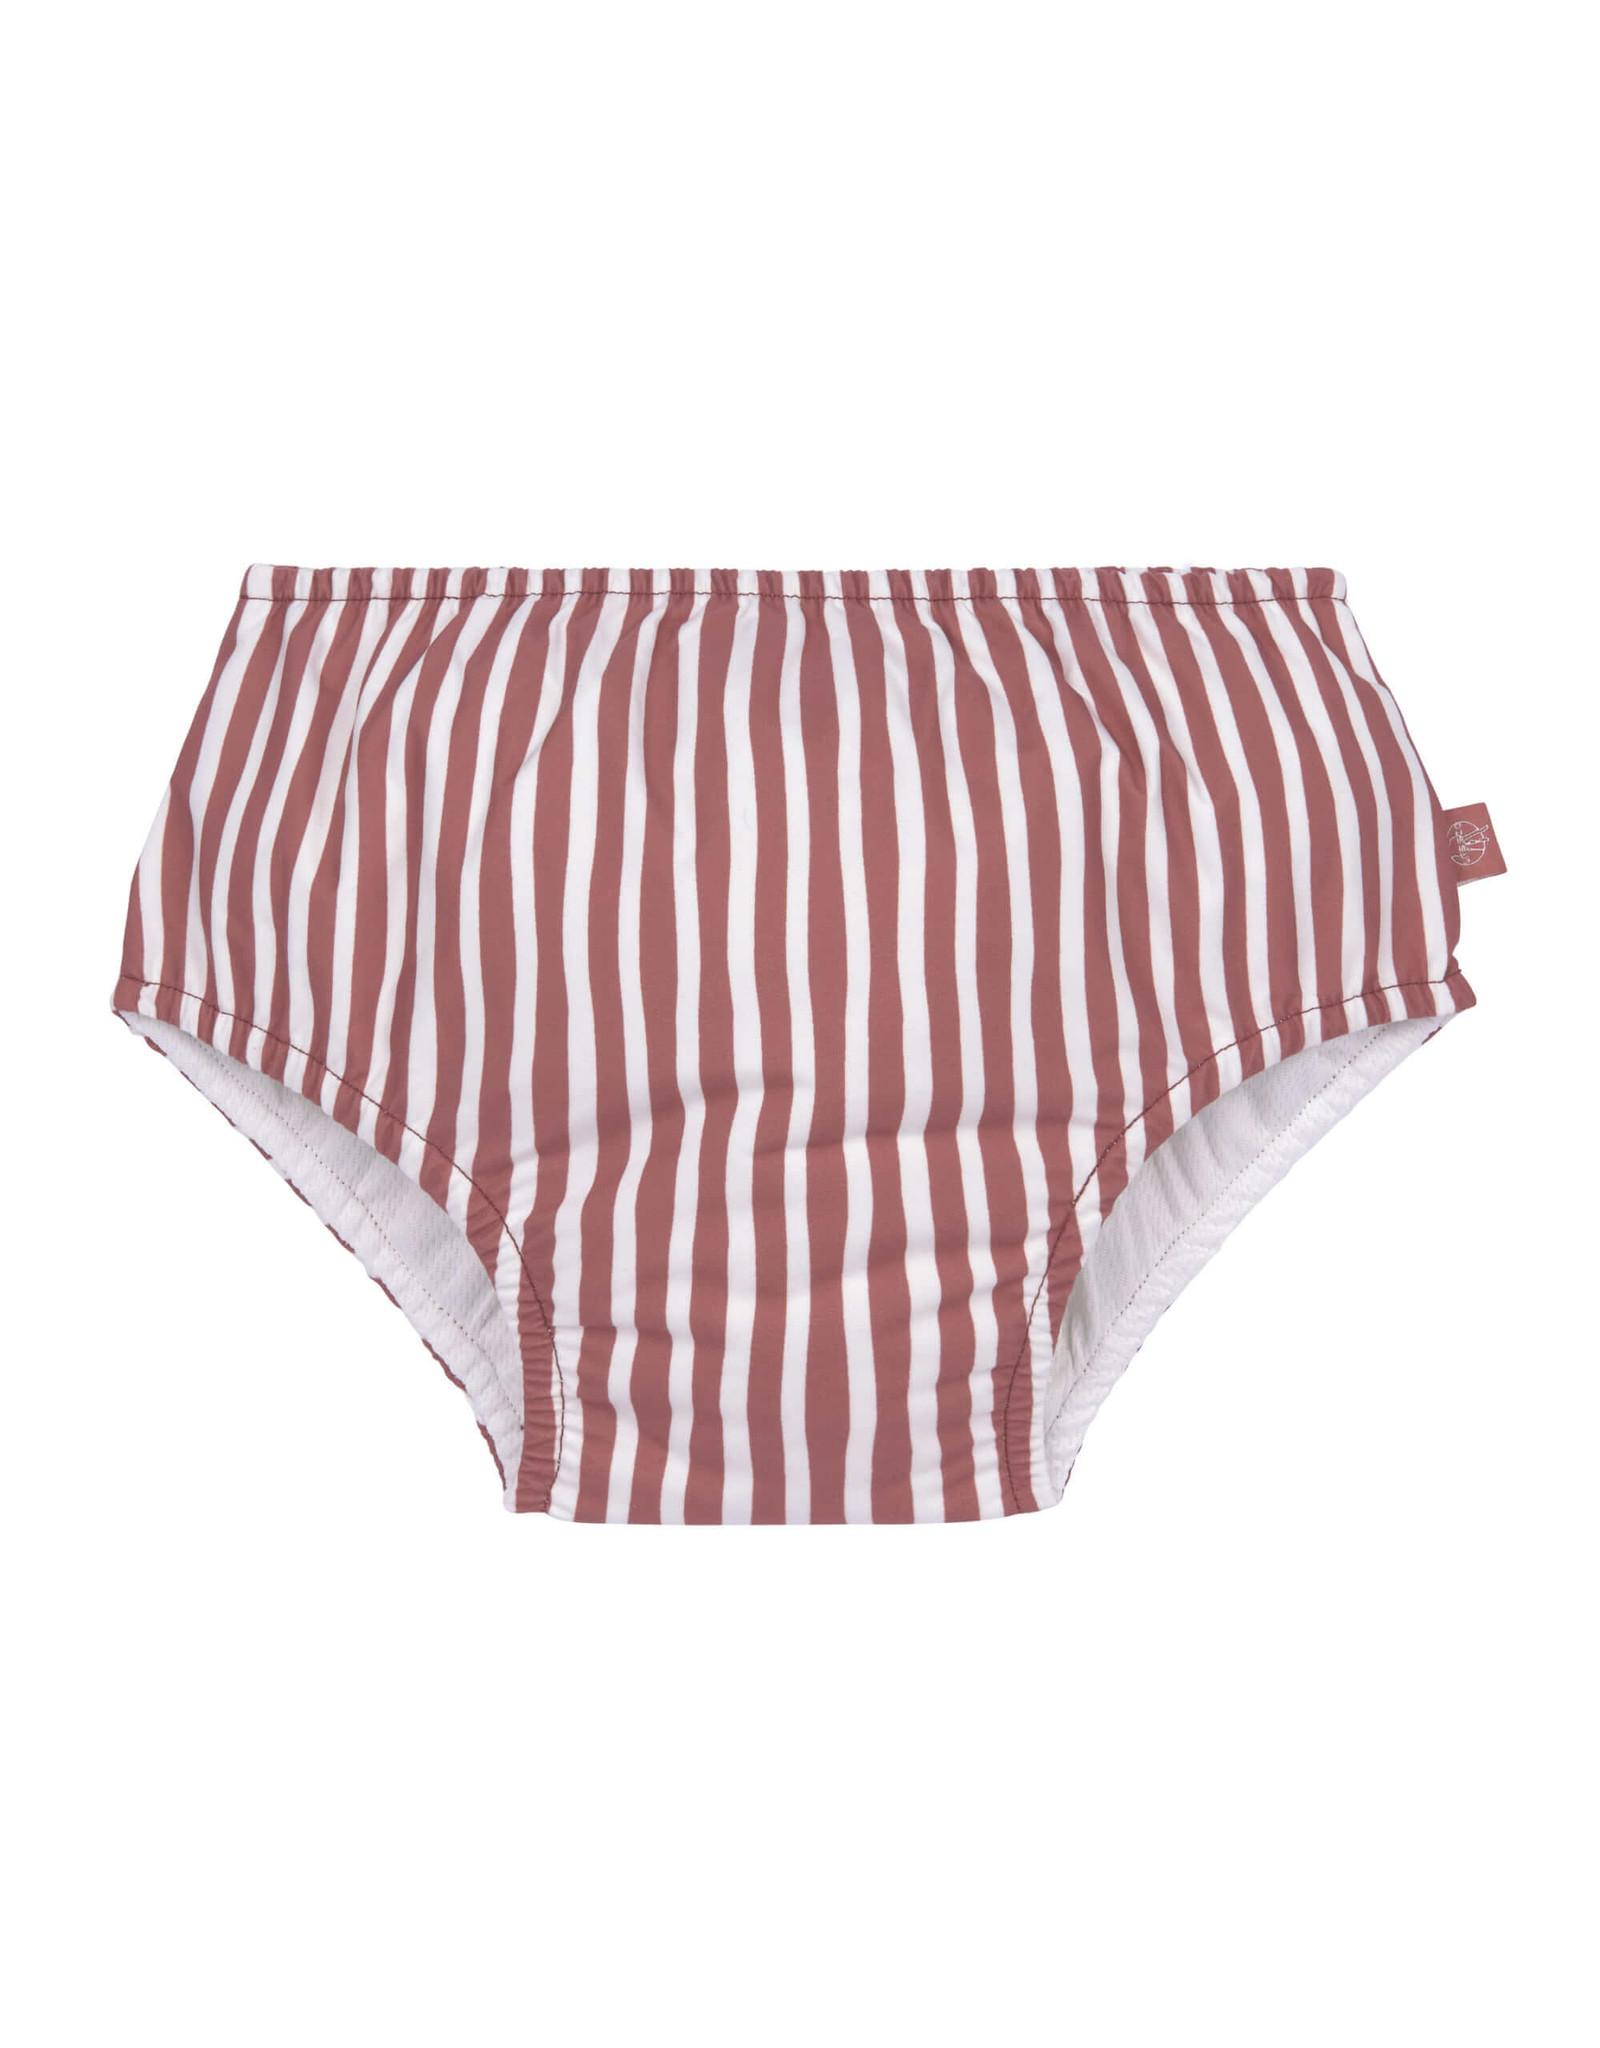 Lassig Lassig Swim Diaper Girl Stripes Red